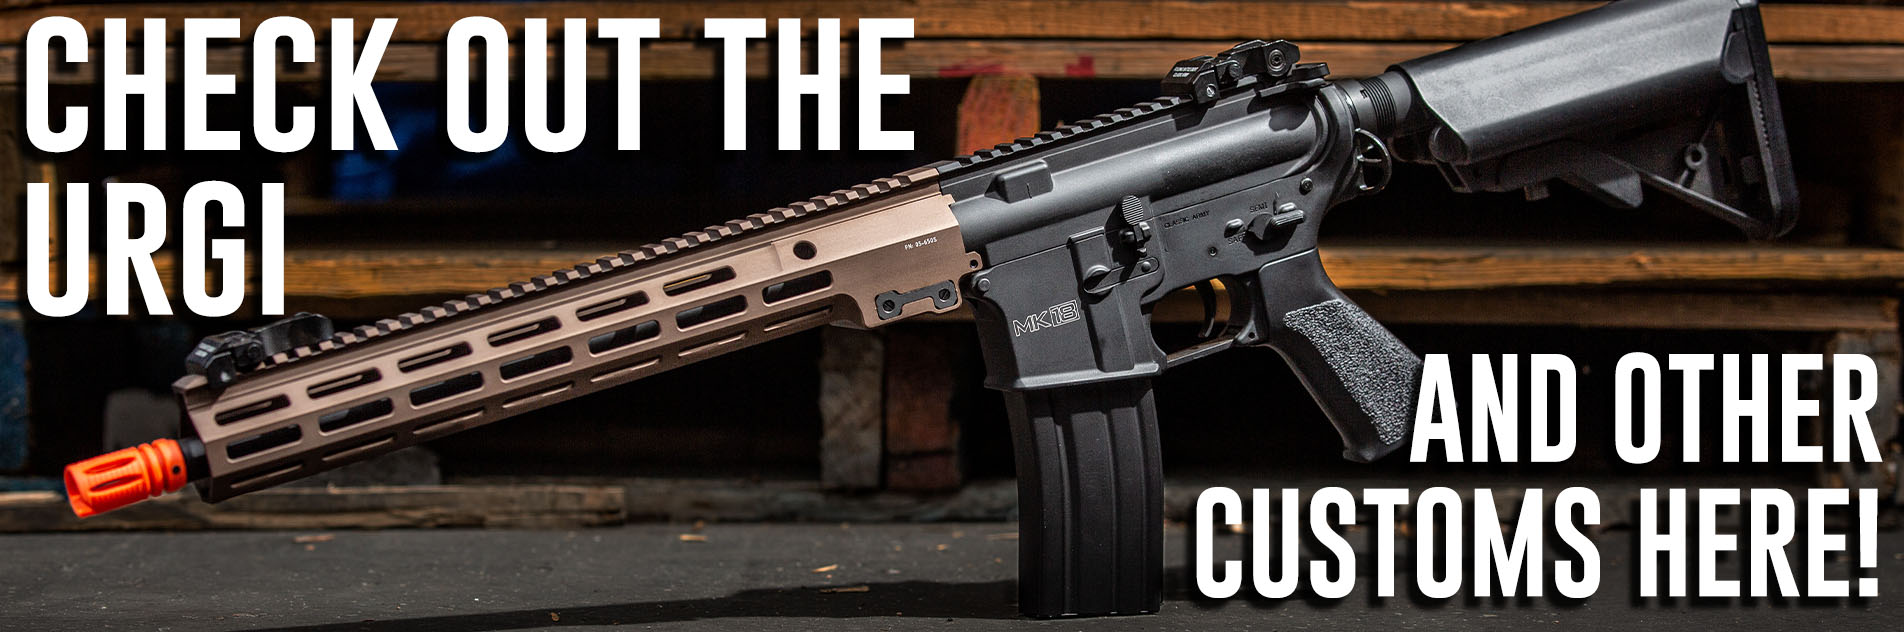 Airsoft GI | Airsoft is a recreational sport for guns enthusiast